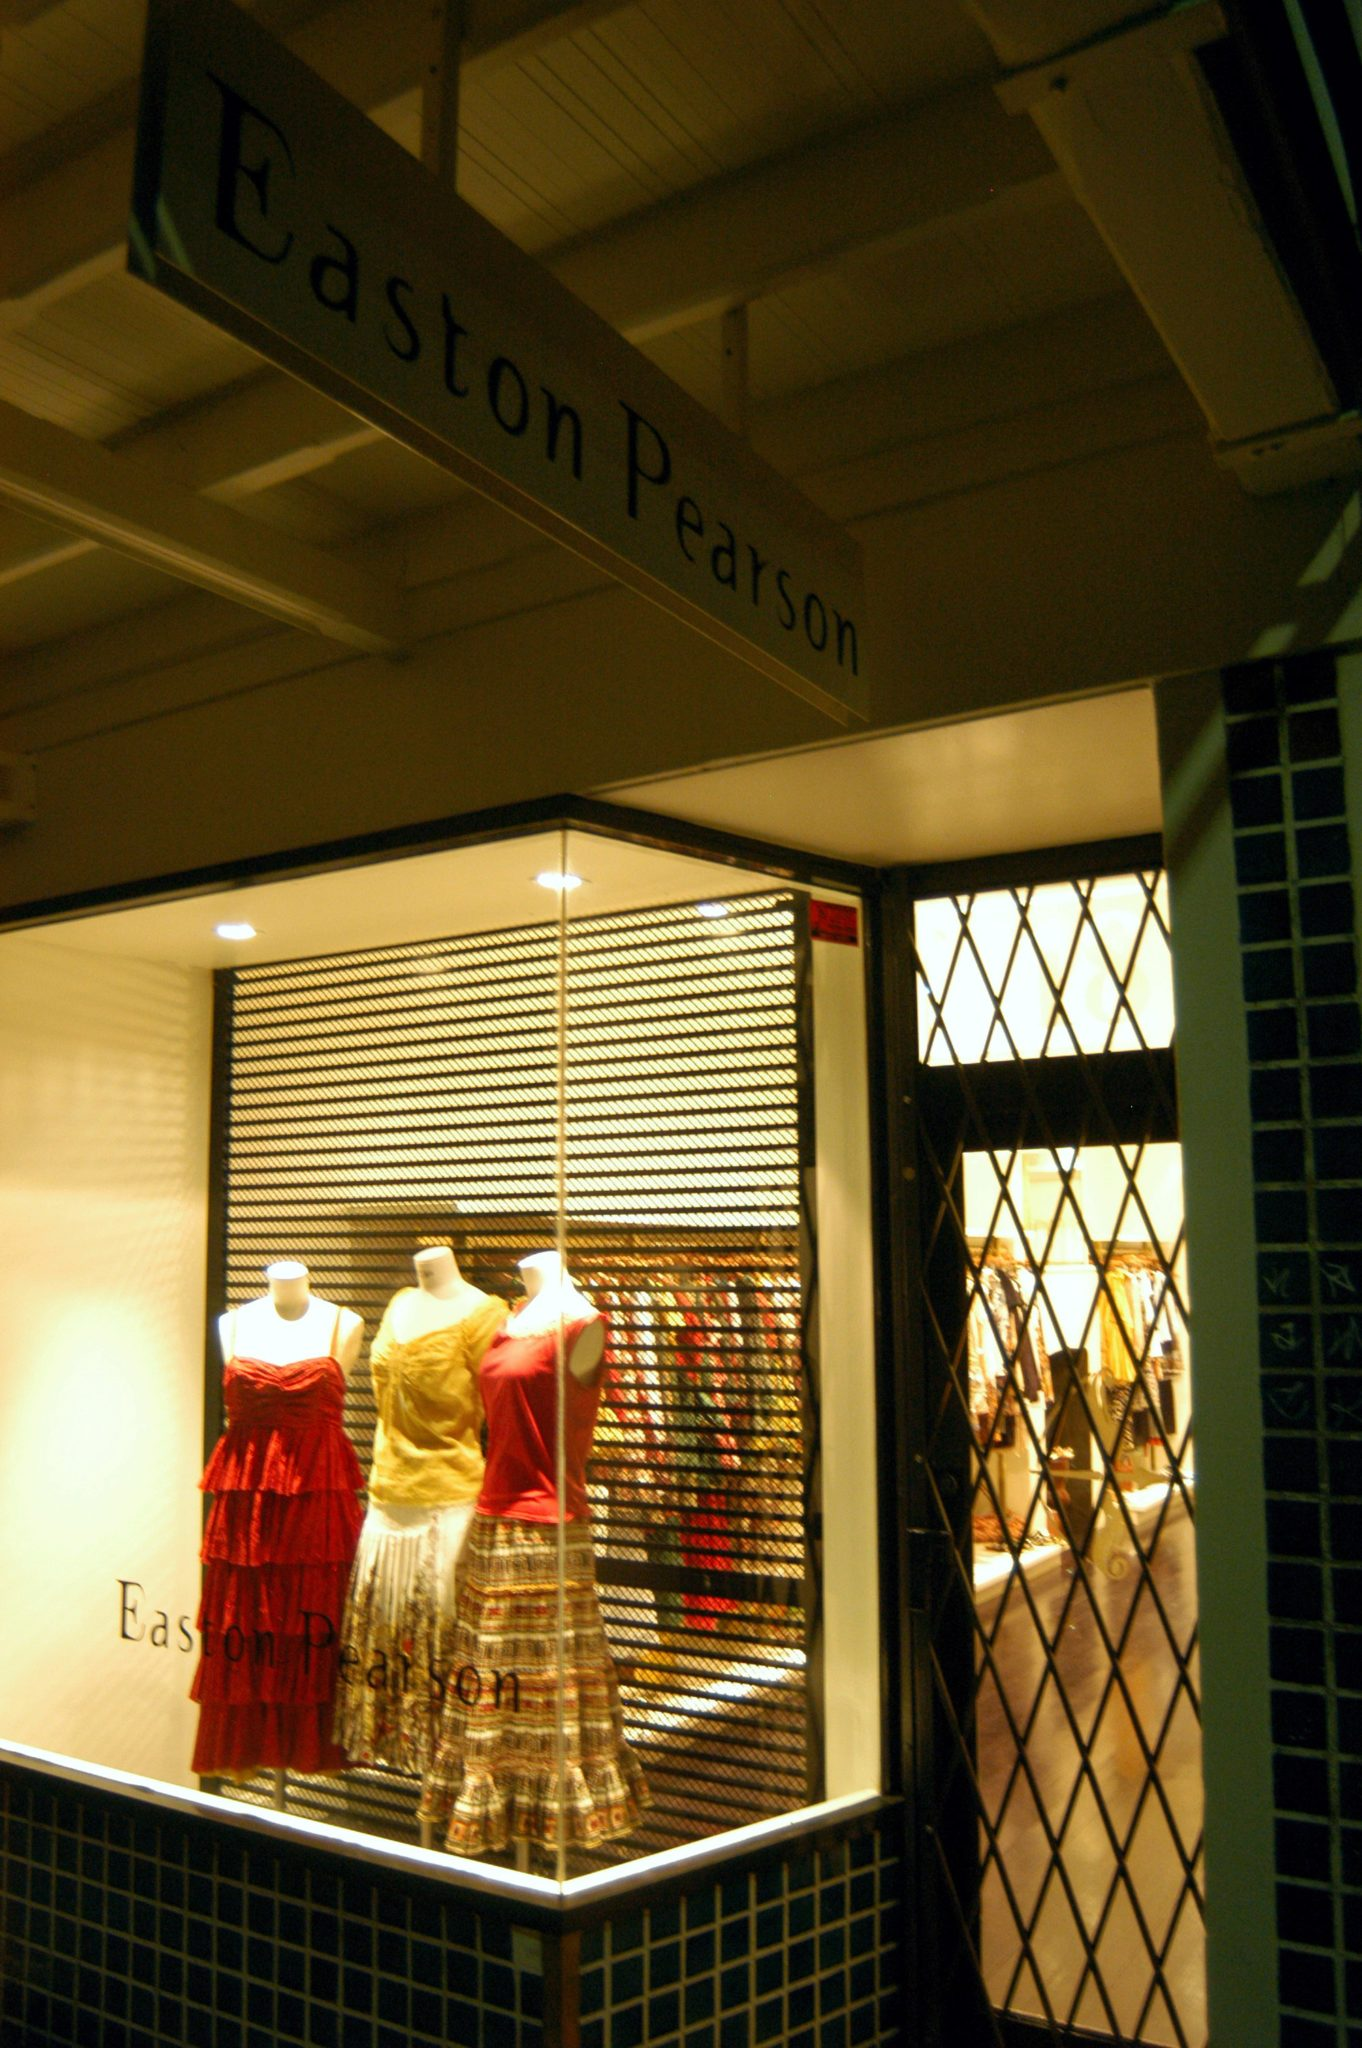 Retail window lighting by Limelight Australia